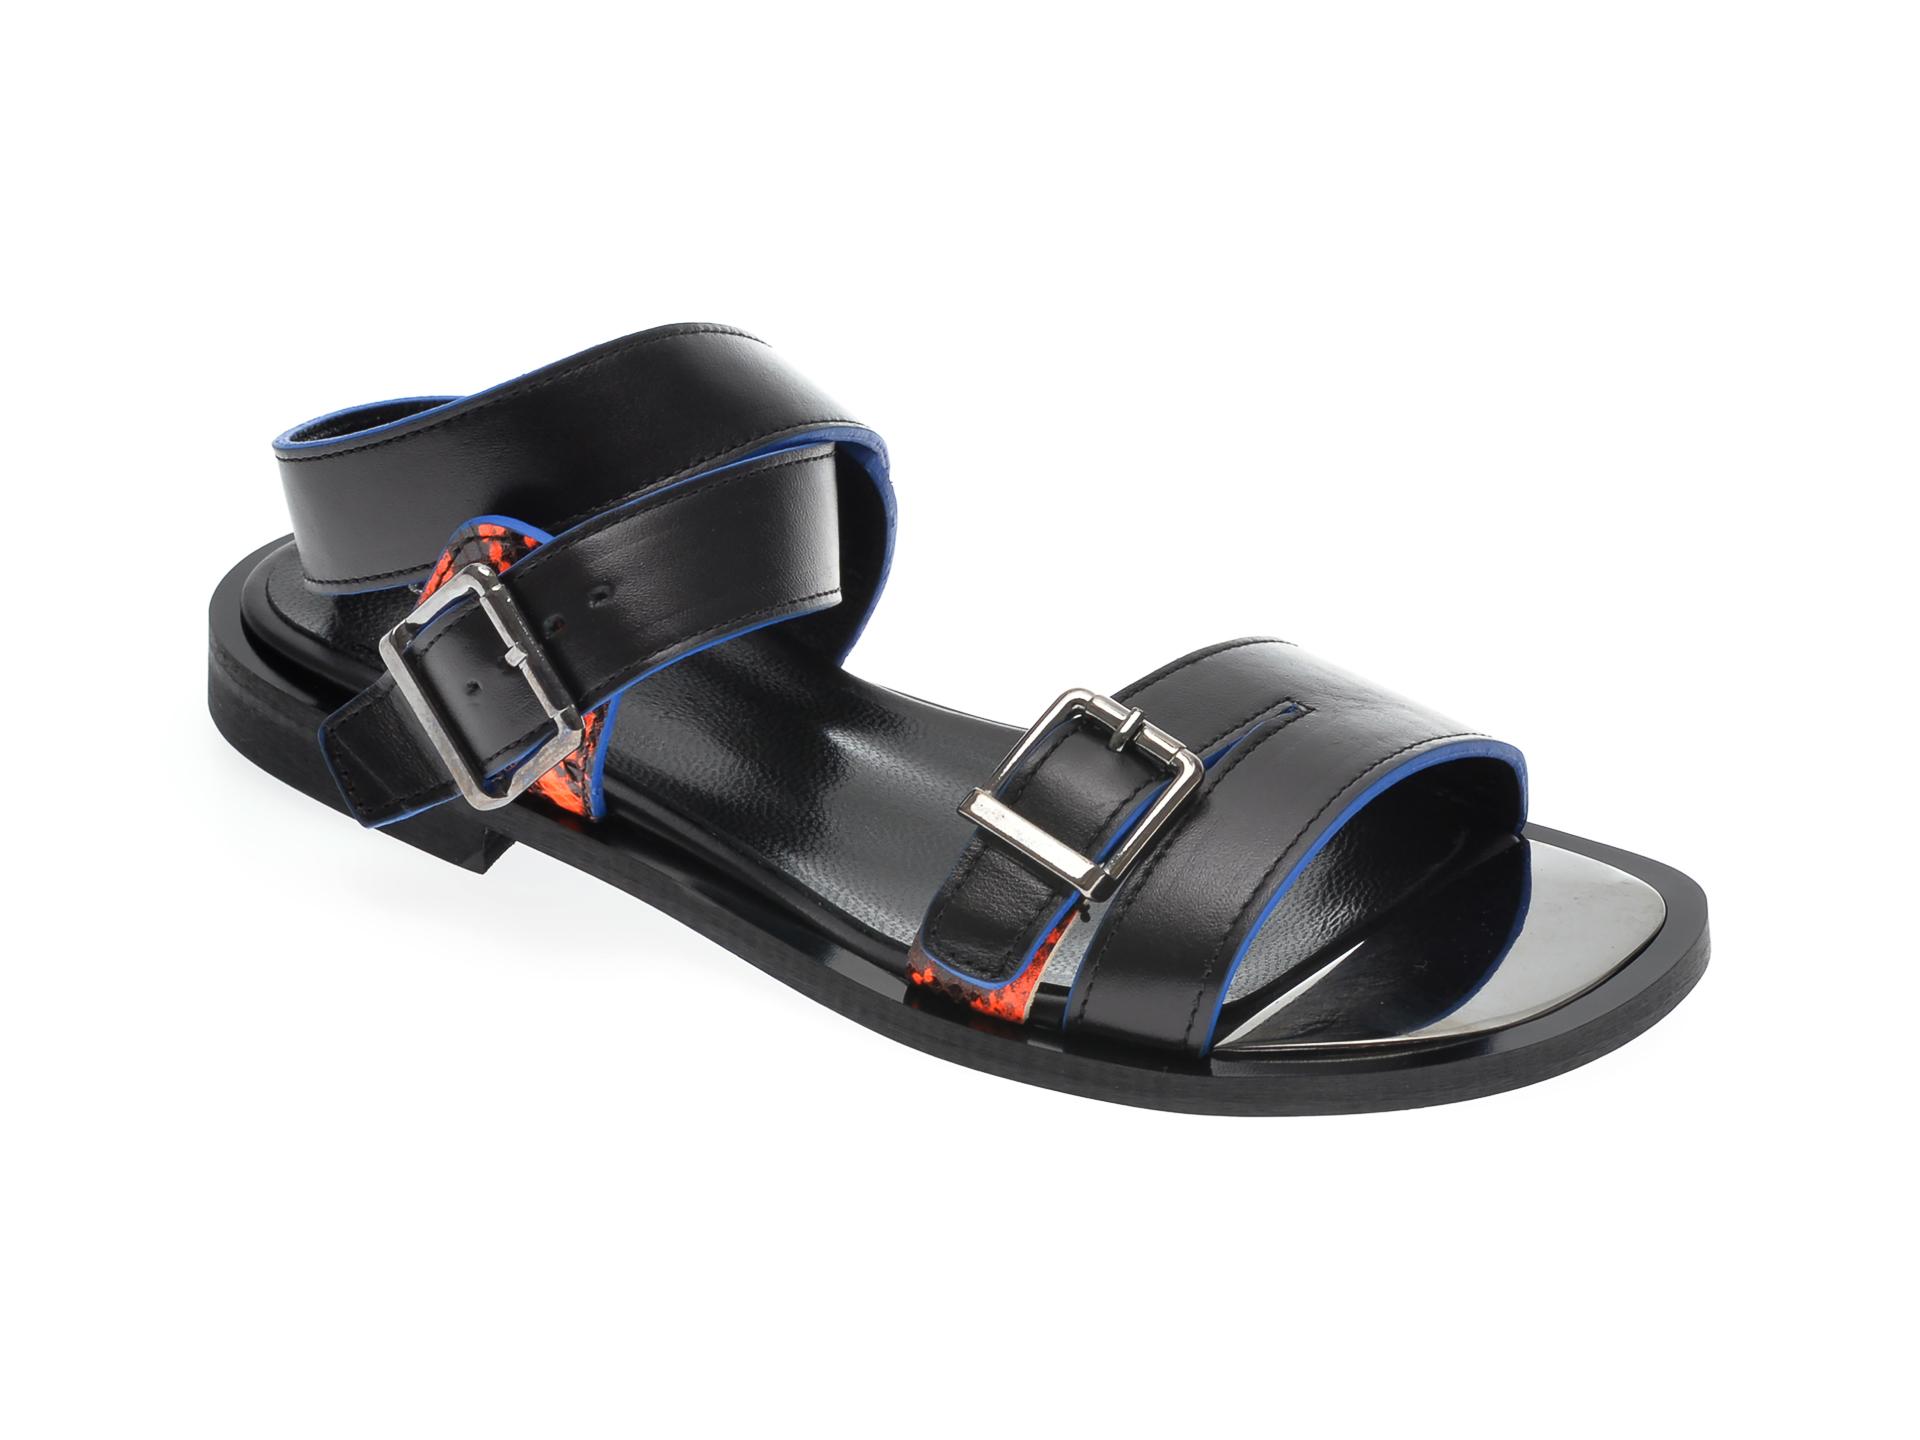 Sandale UNICA negre, A5578, din piele naturala